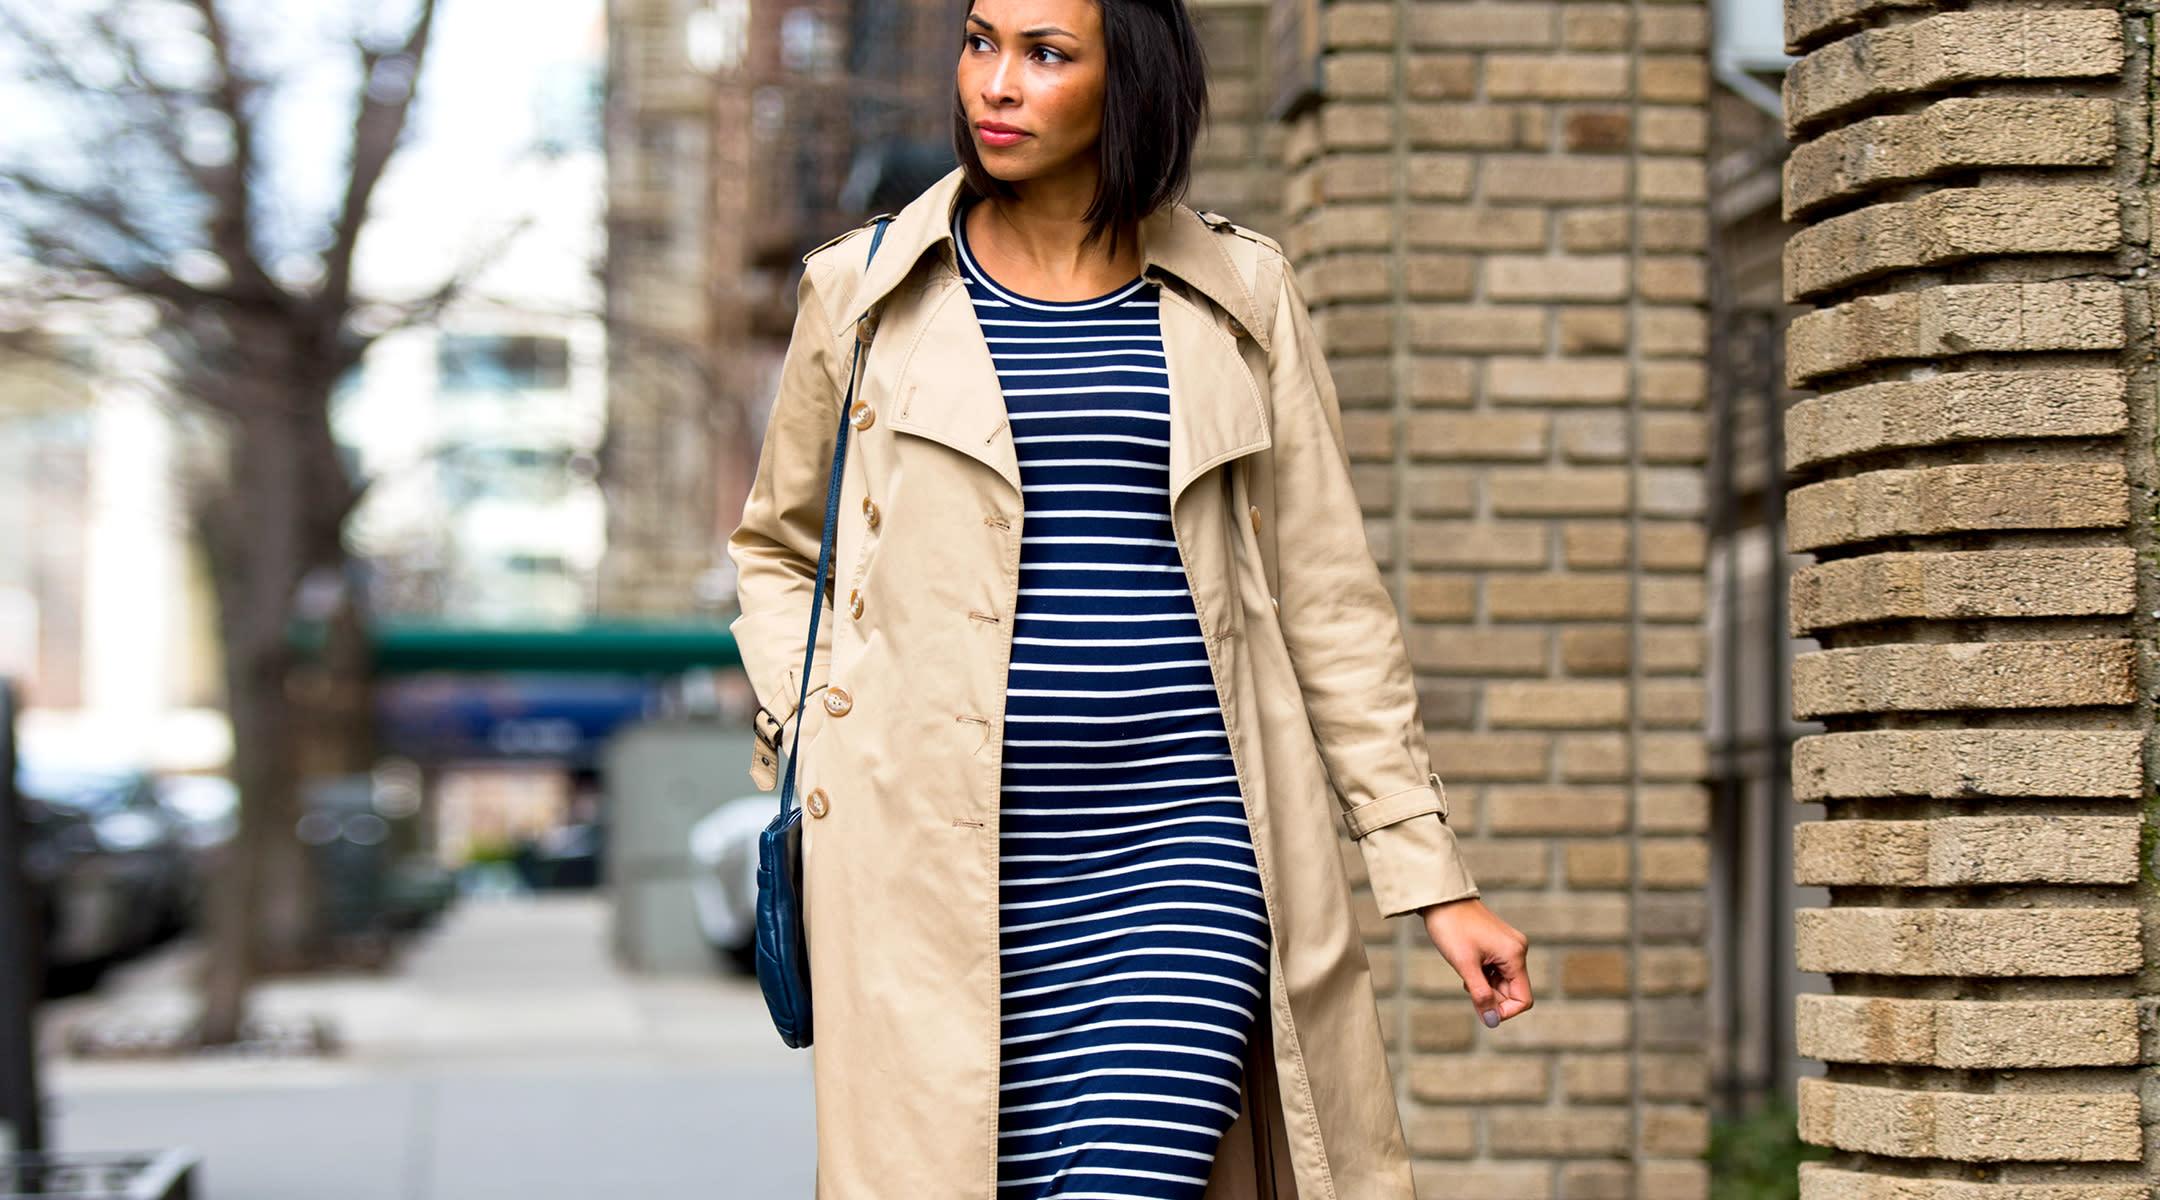 stylish pregnant woman walking outside